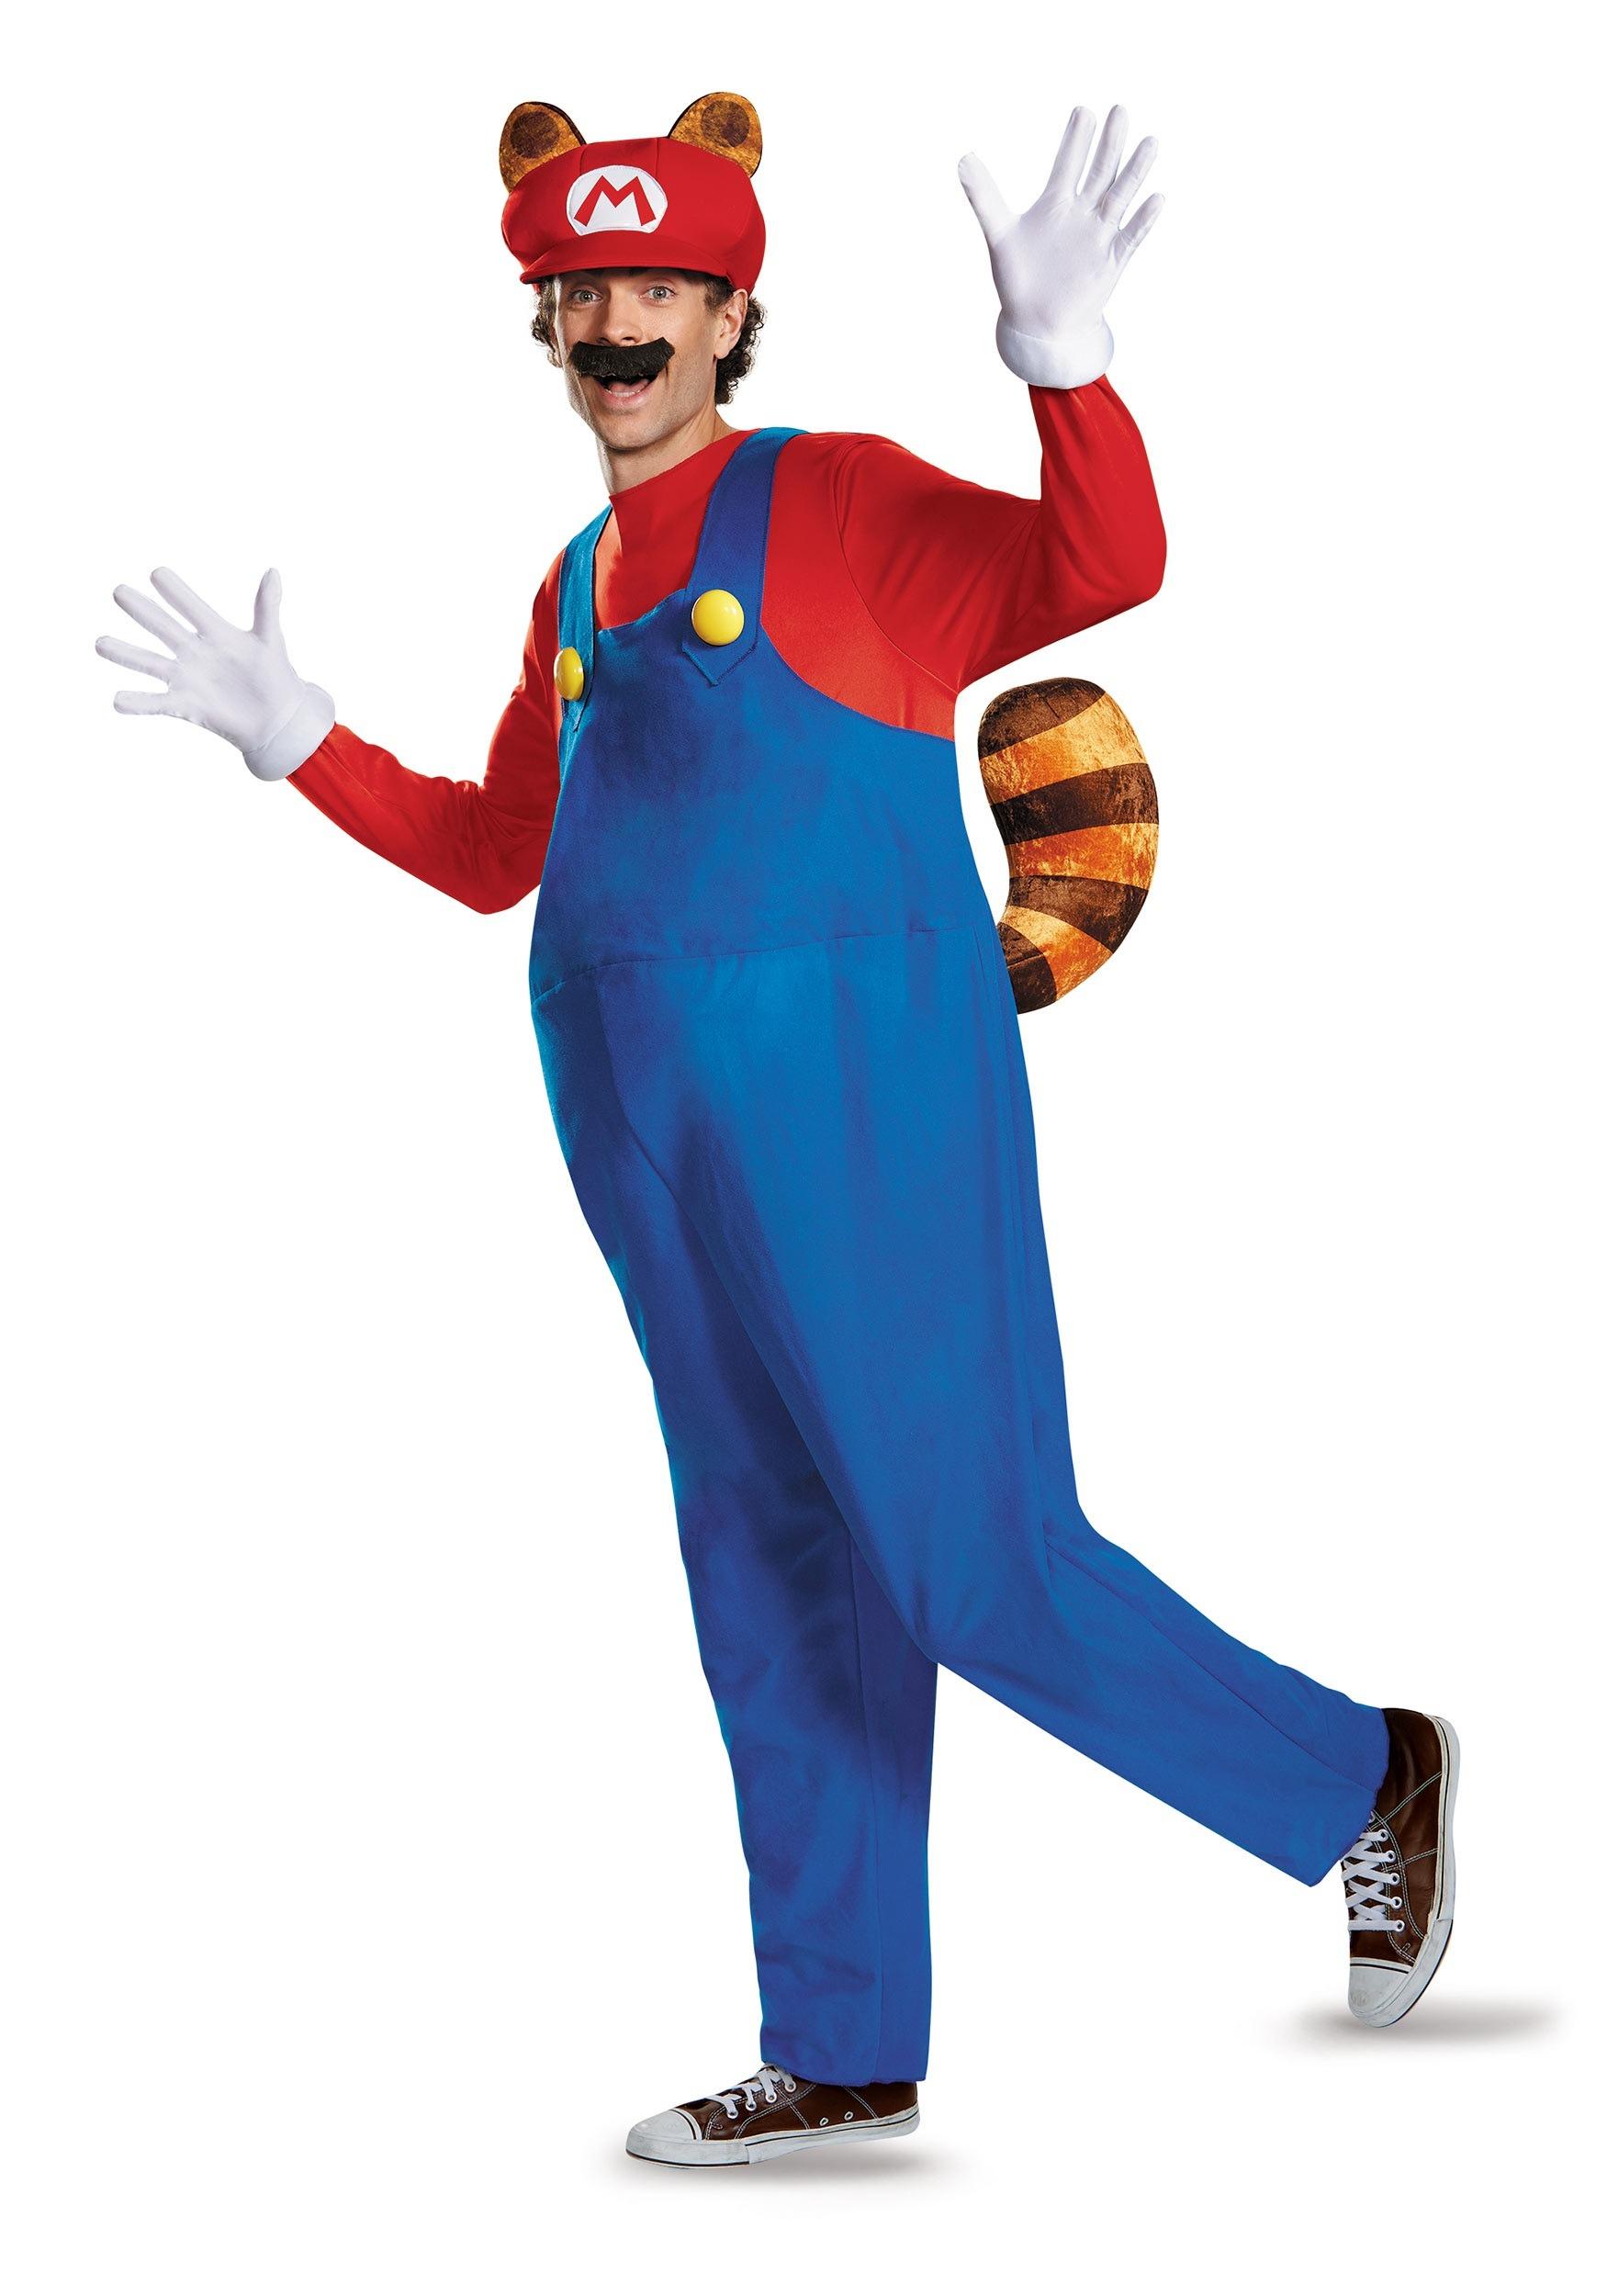 Plus Size Adult Deluxe Mario Raccoon Costume  sc 1 st  Halloween Costumes & Super Mario Bros. Costumes - HalloweenCostumes.com